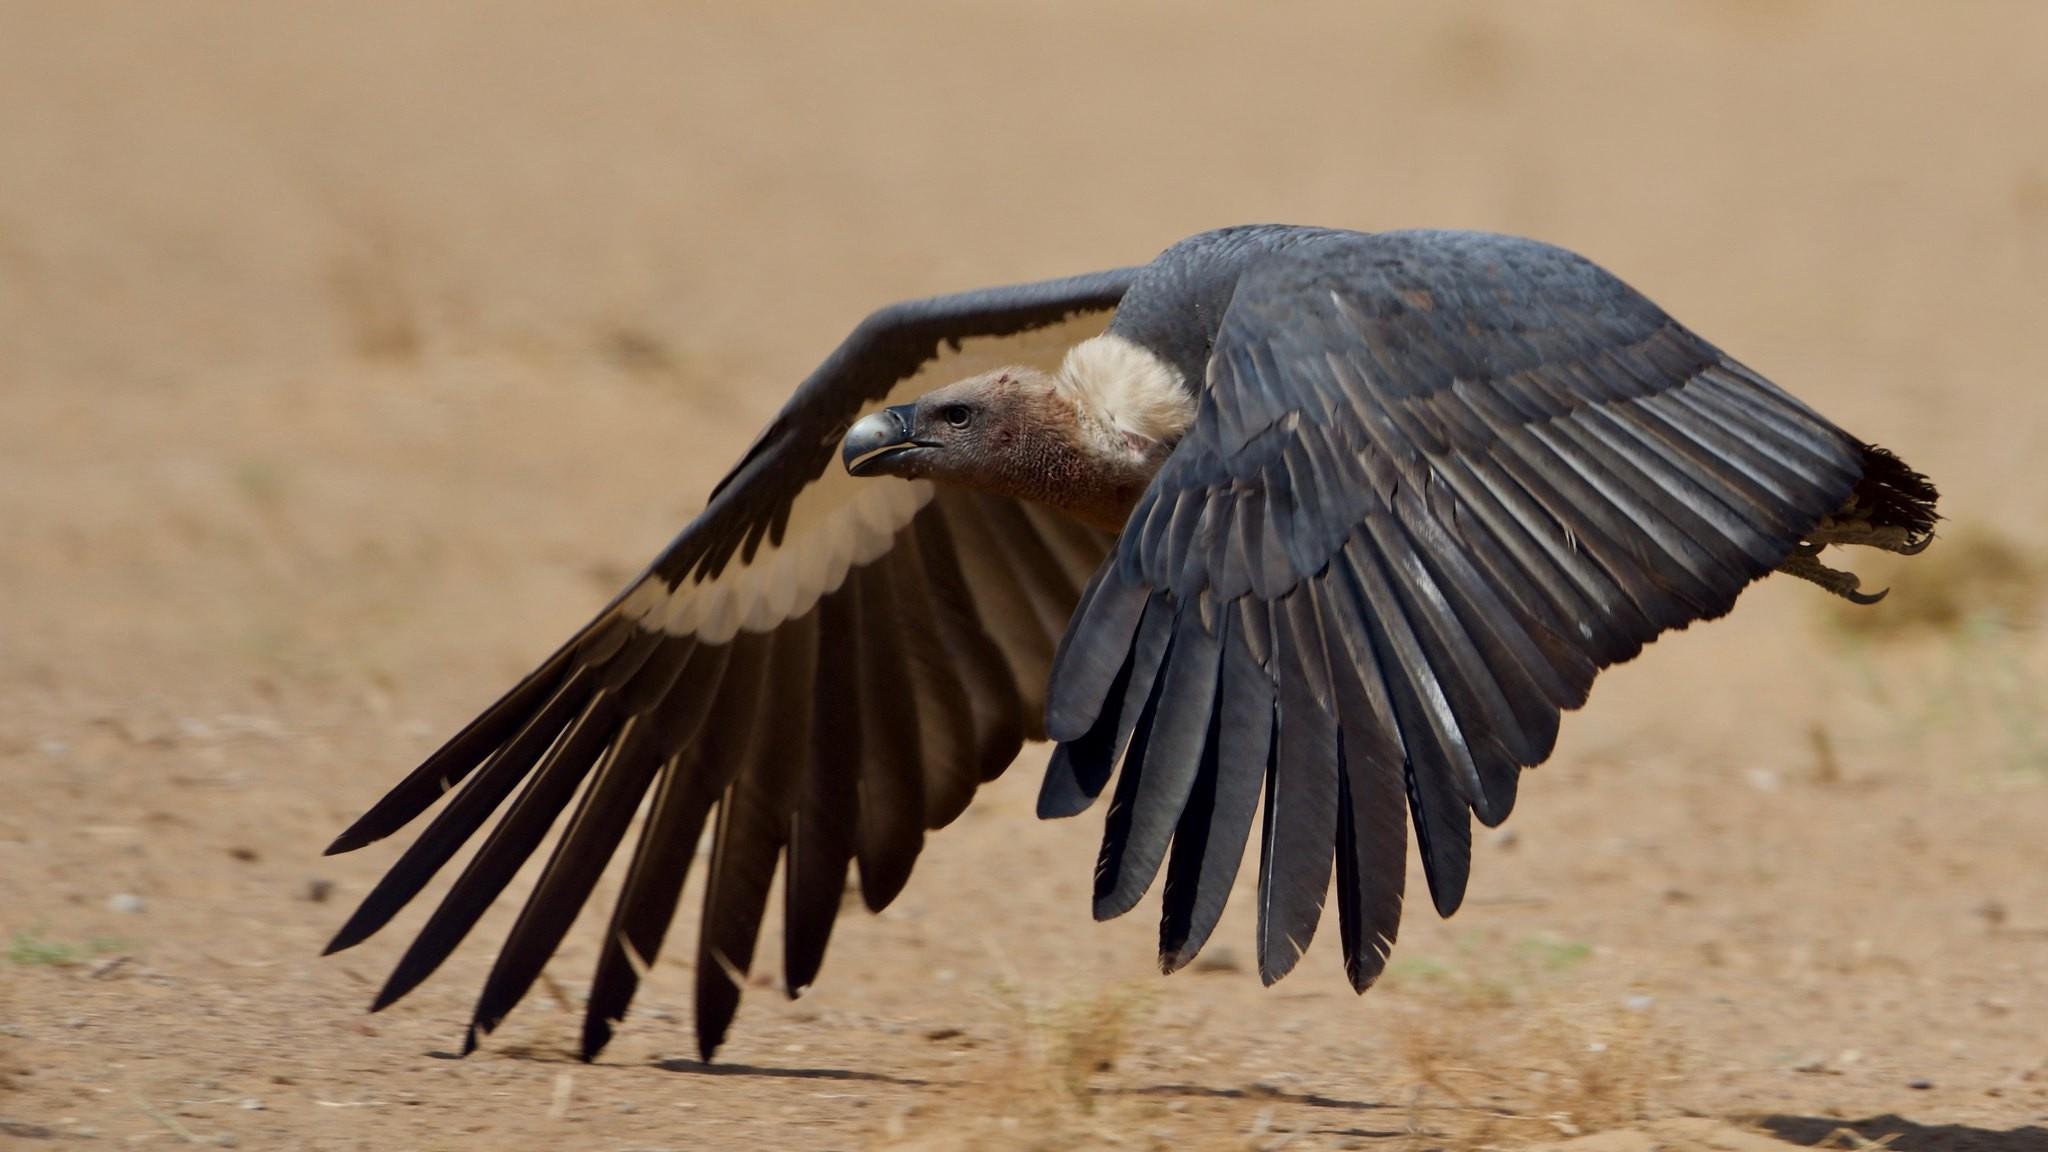 Distribution of Indian vultures